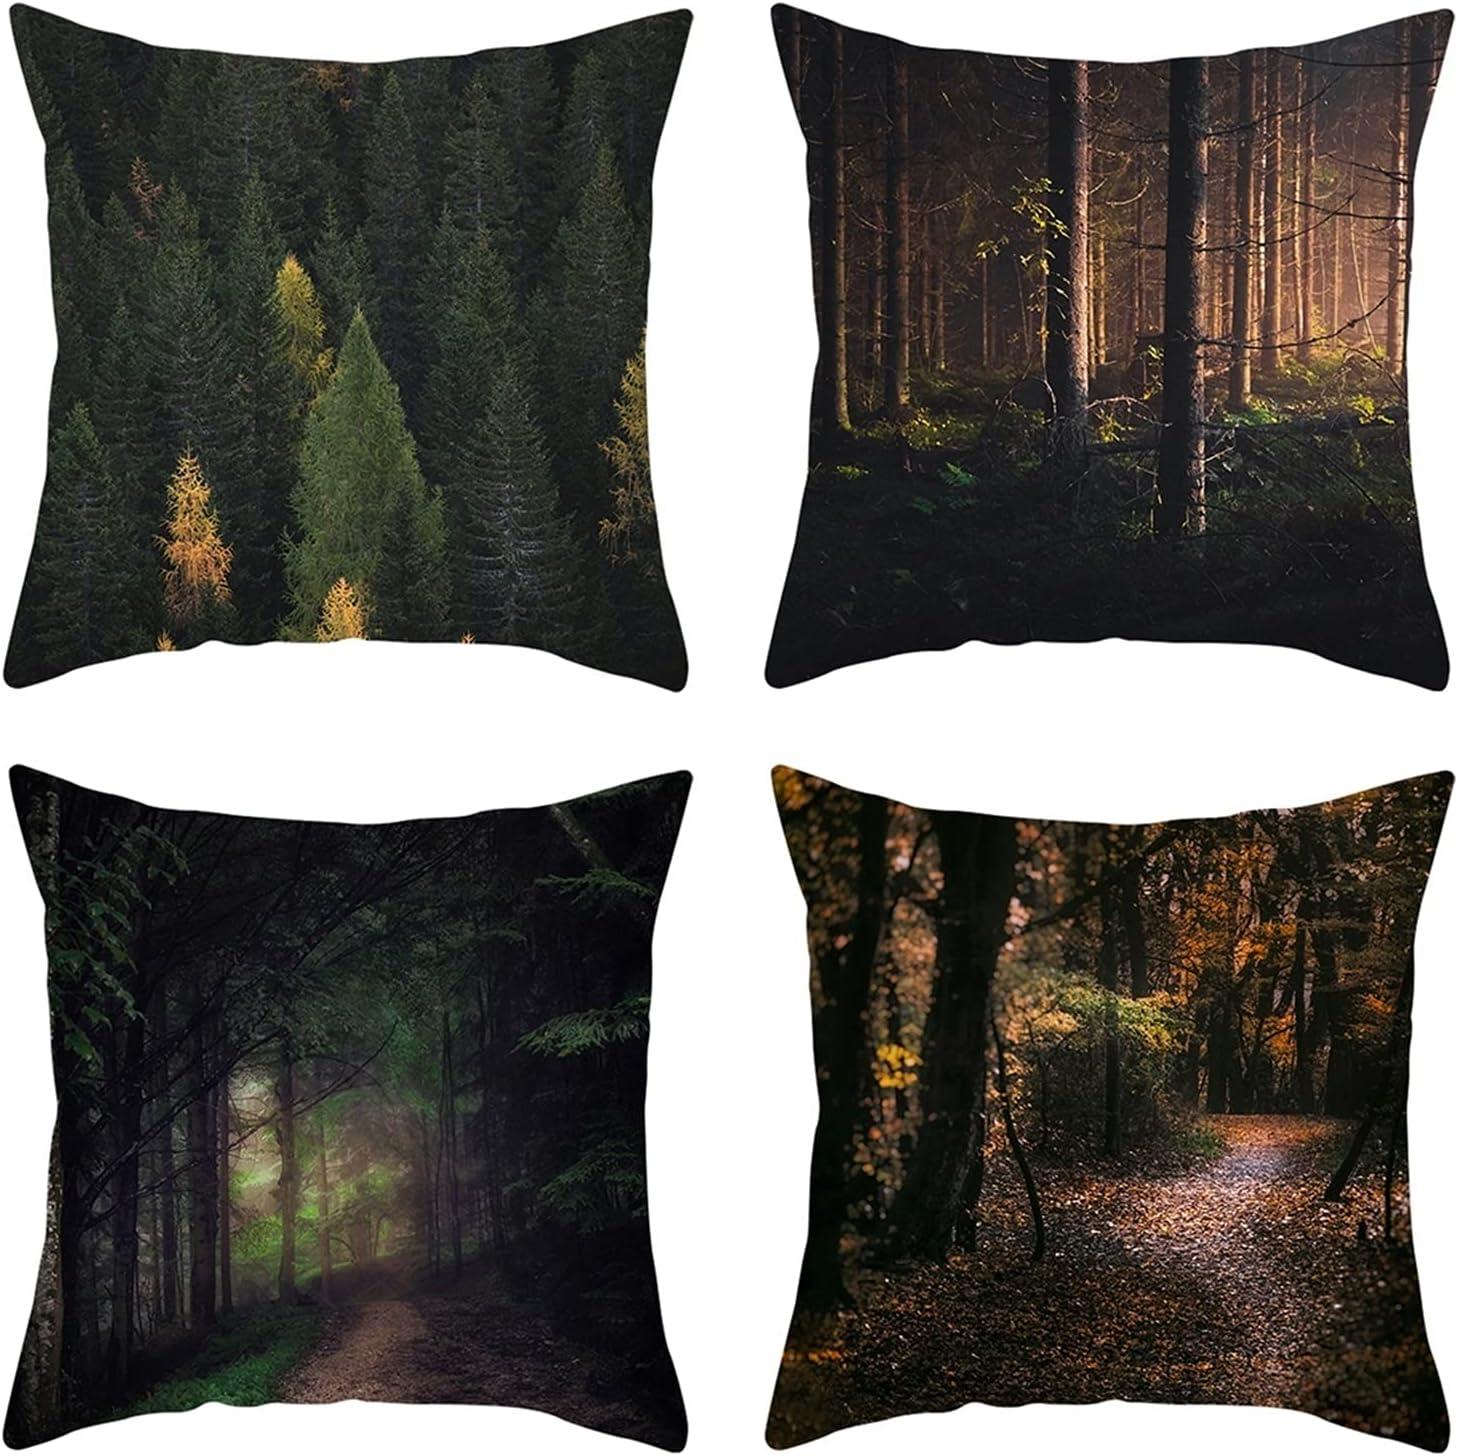 Daesar Pillow Cases Under blast sales Superior Decorative B Set Covers 4